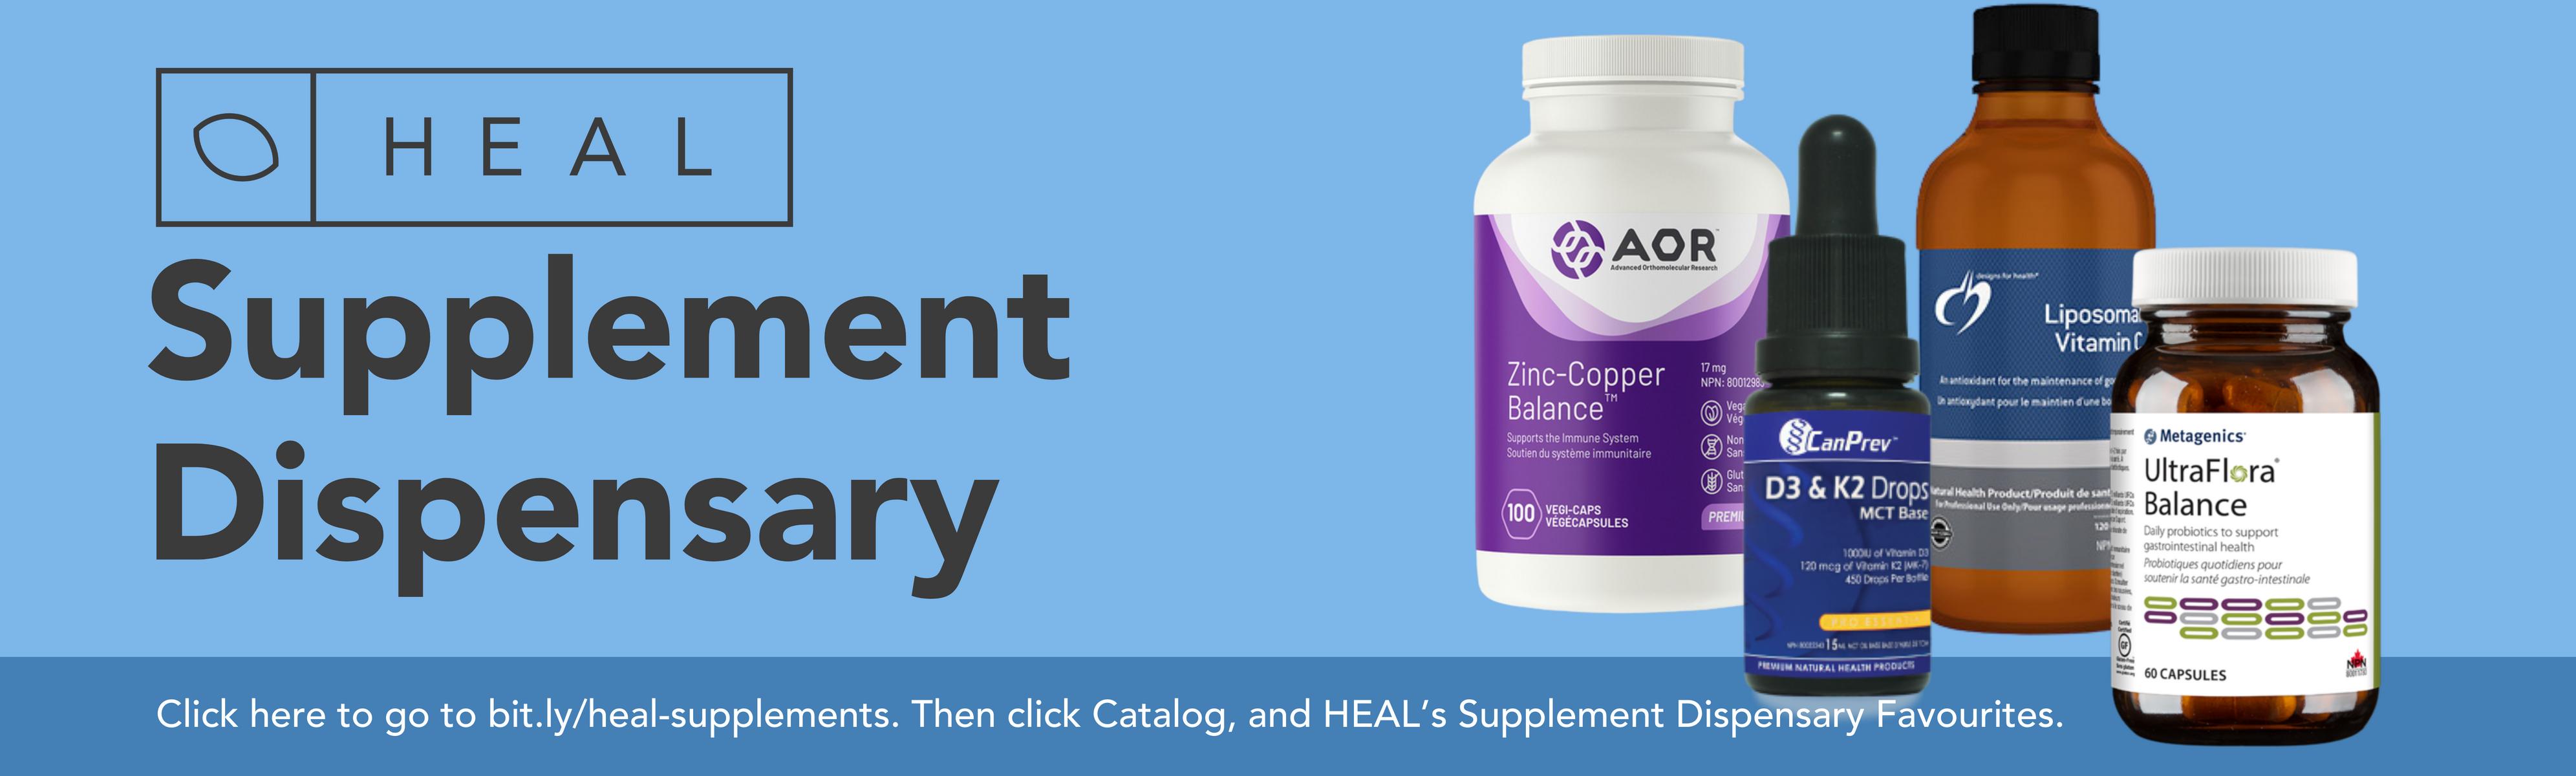 HEAL Supplement Dispensary